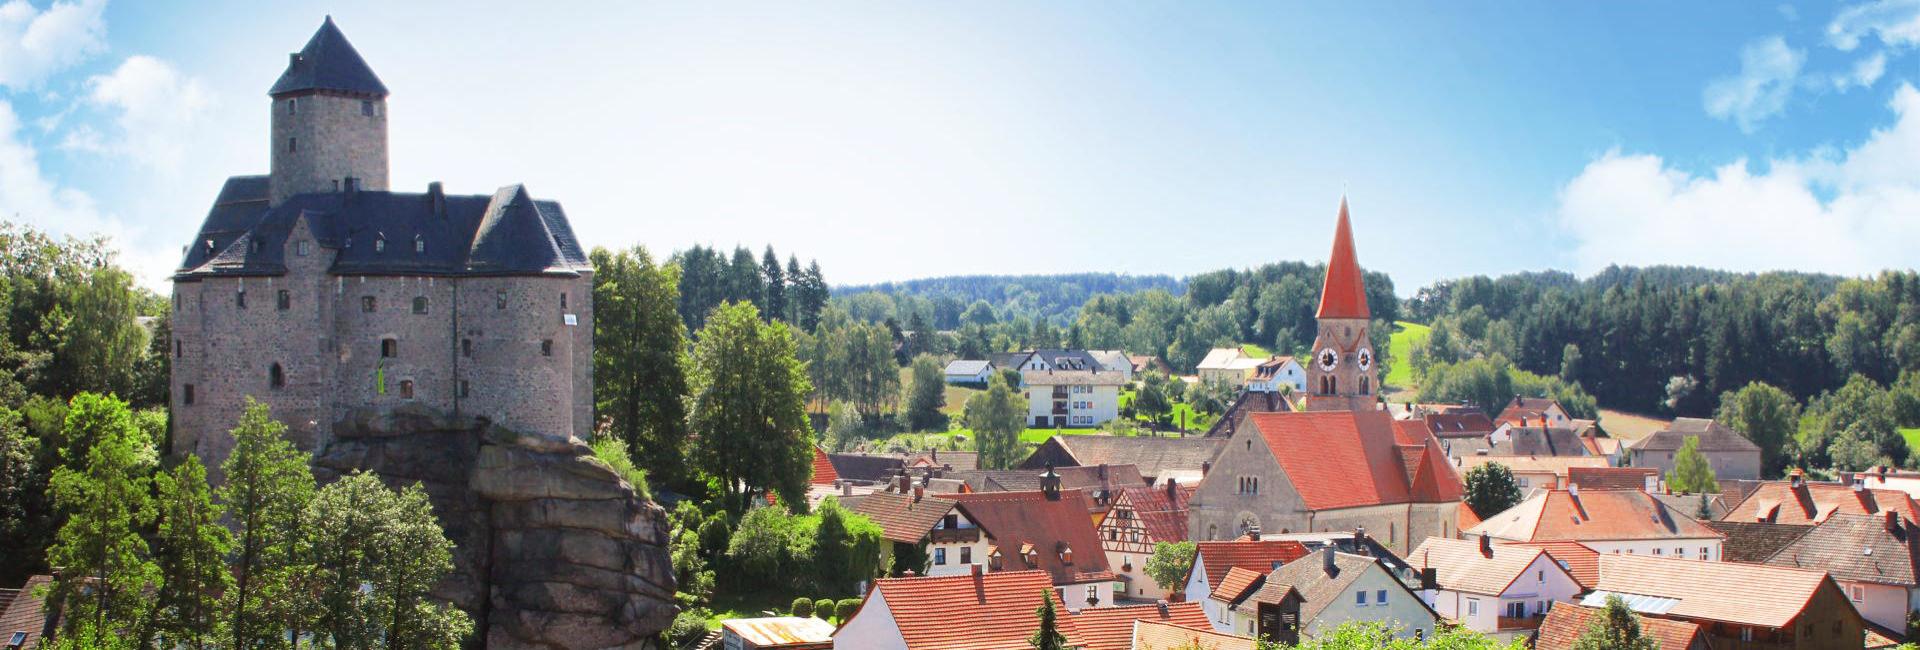 falkenberg_burg_bayern_oberpfalz_1920x650_acf_cropped